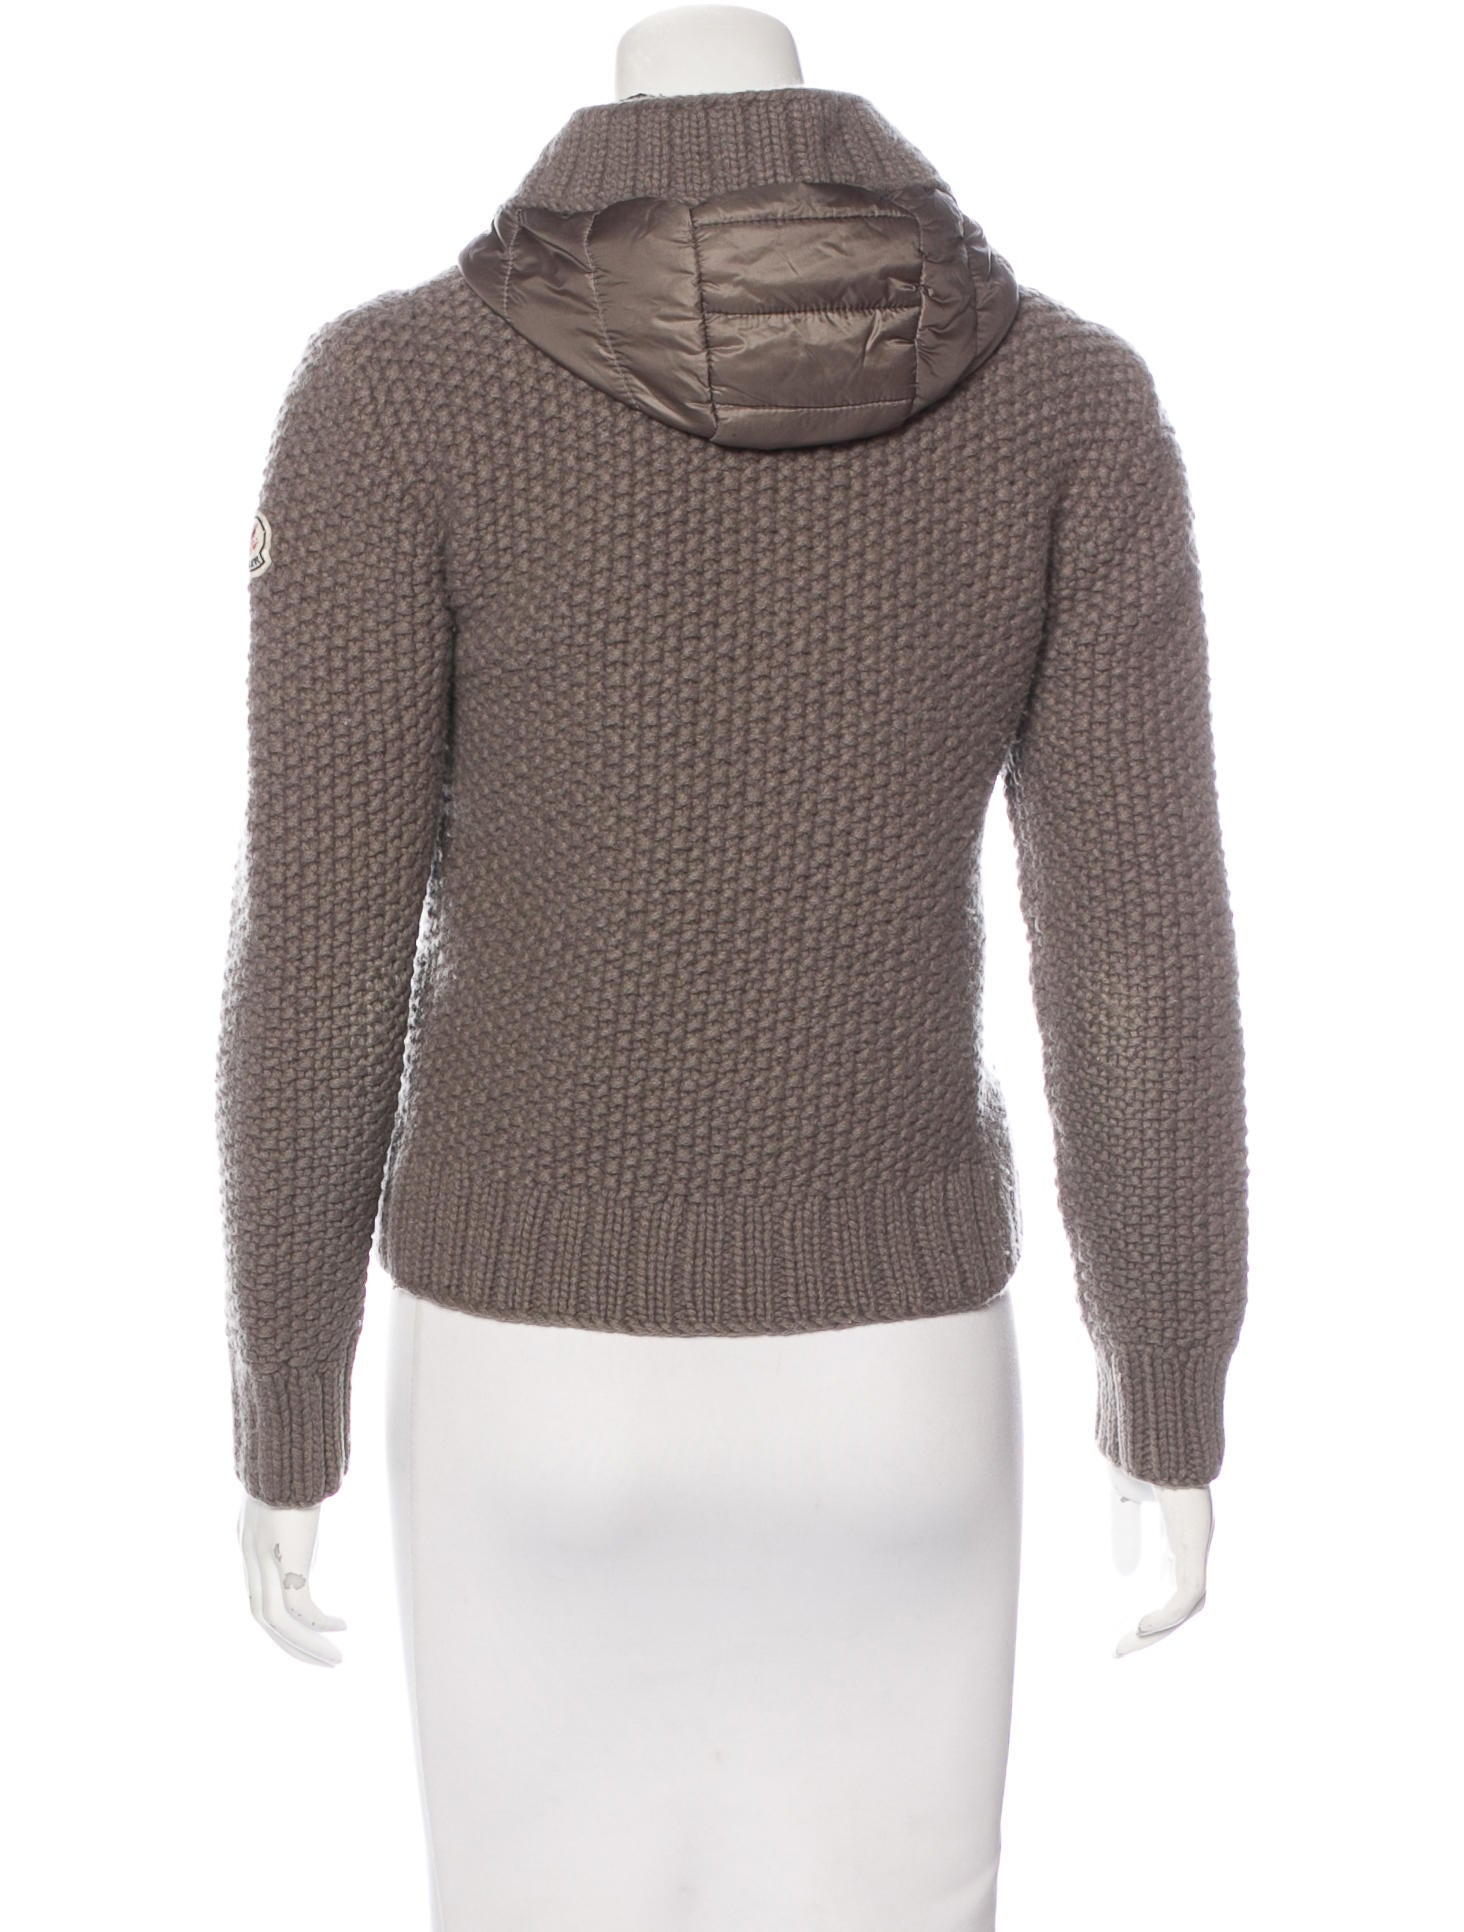 Hooded Wool Cardigan - Full Zip Sweater